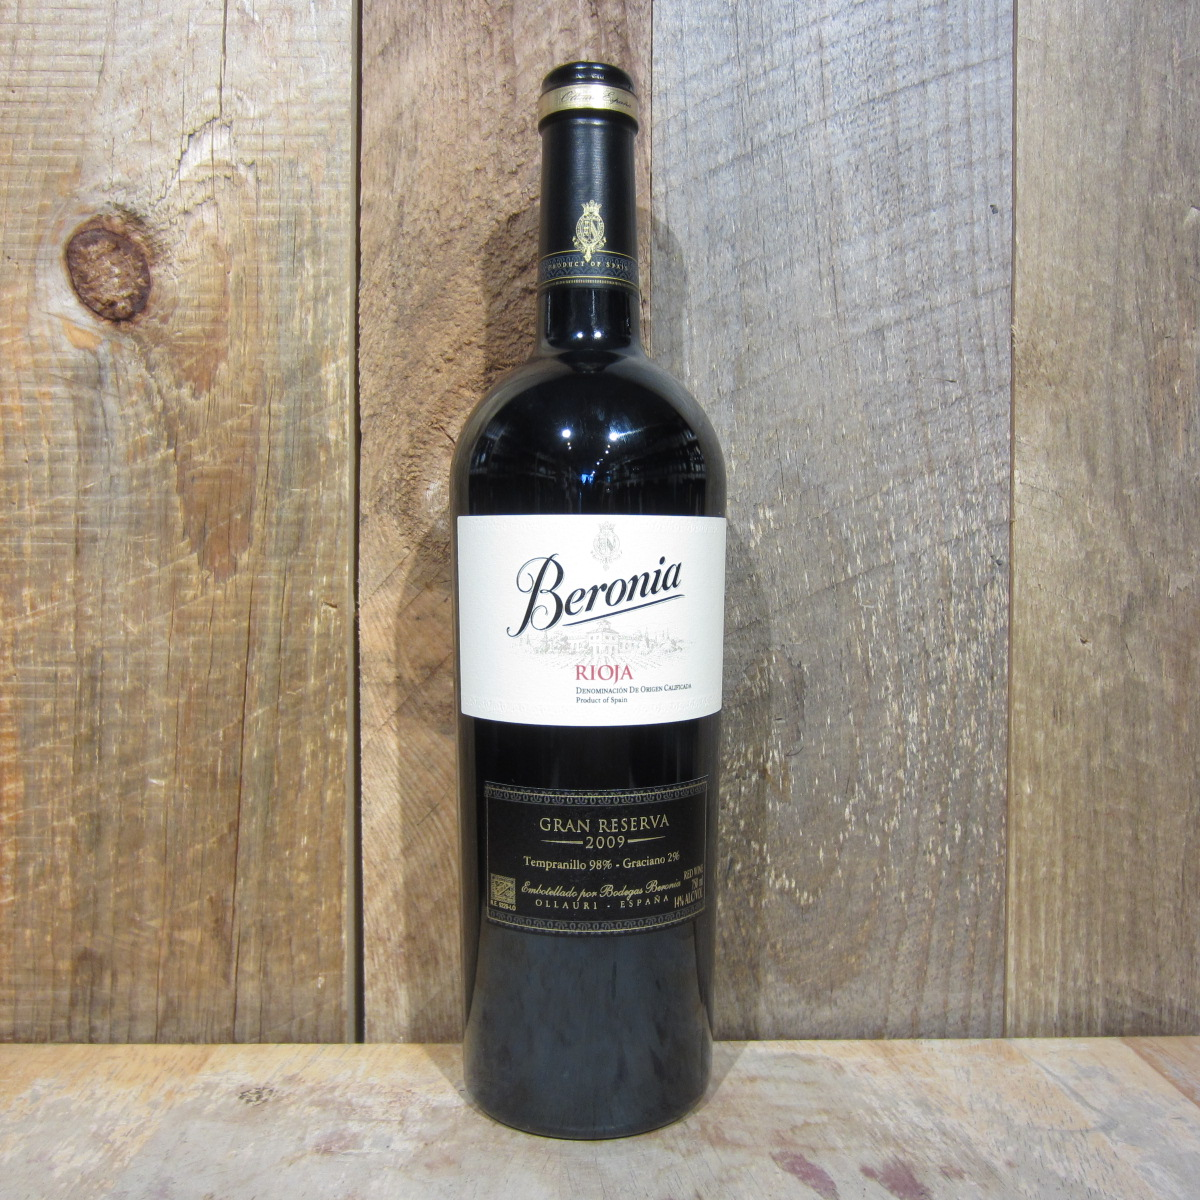 Beronia Rioja Gran Reserva 2010 750ml